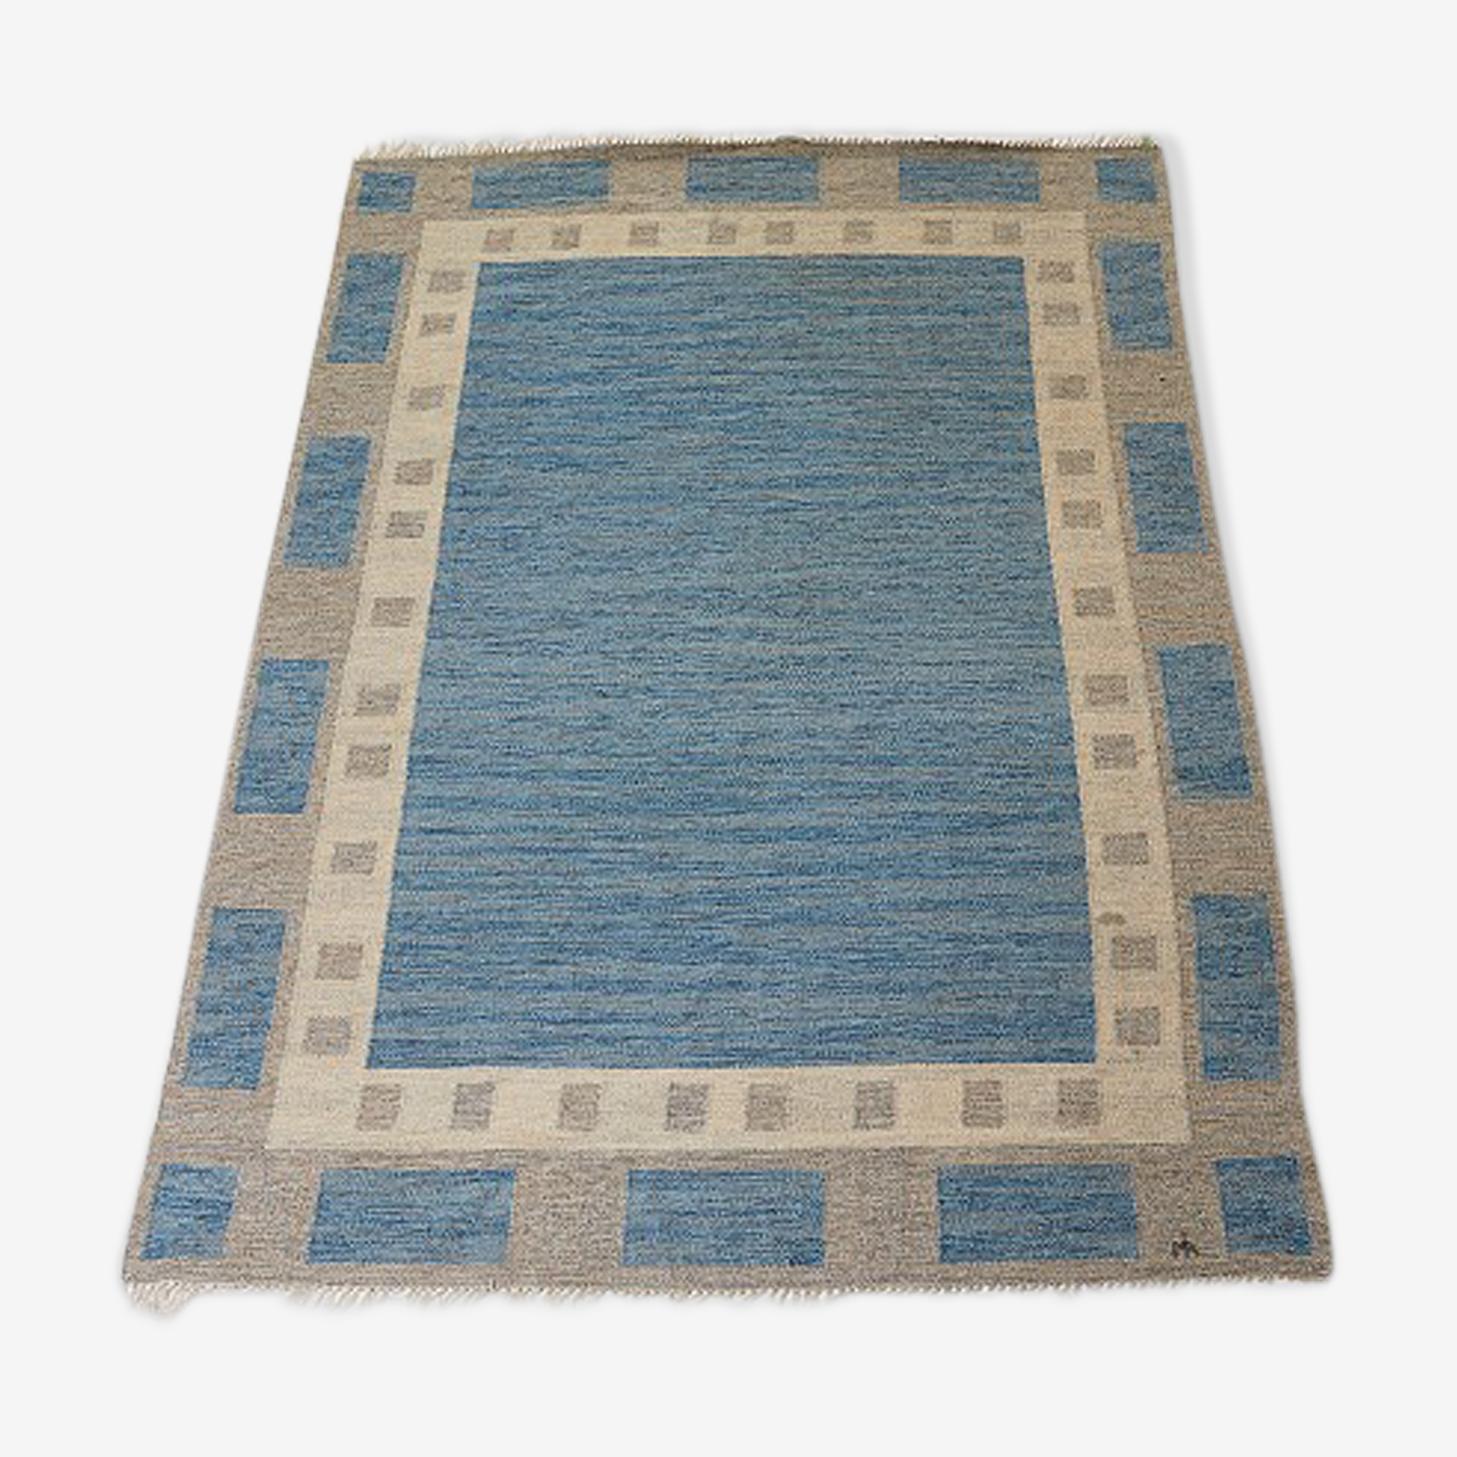 Margareta Akerberg 200x140cm carpet